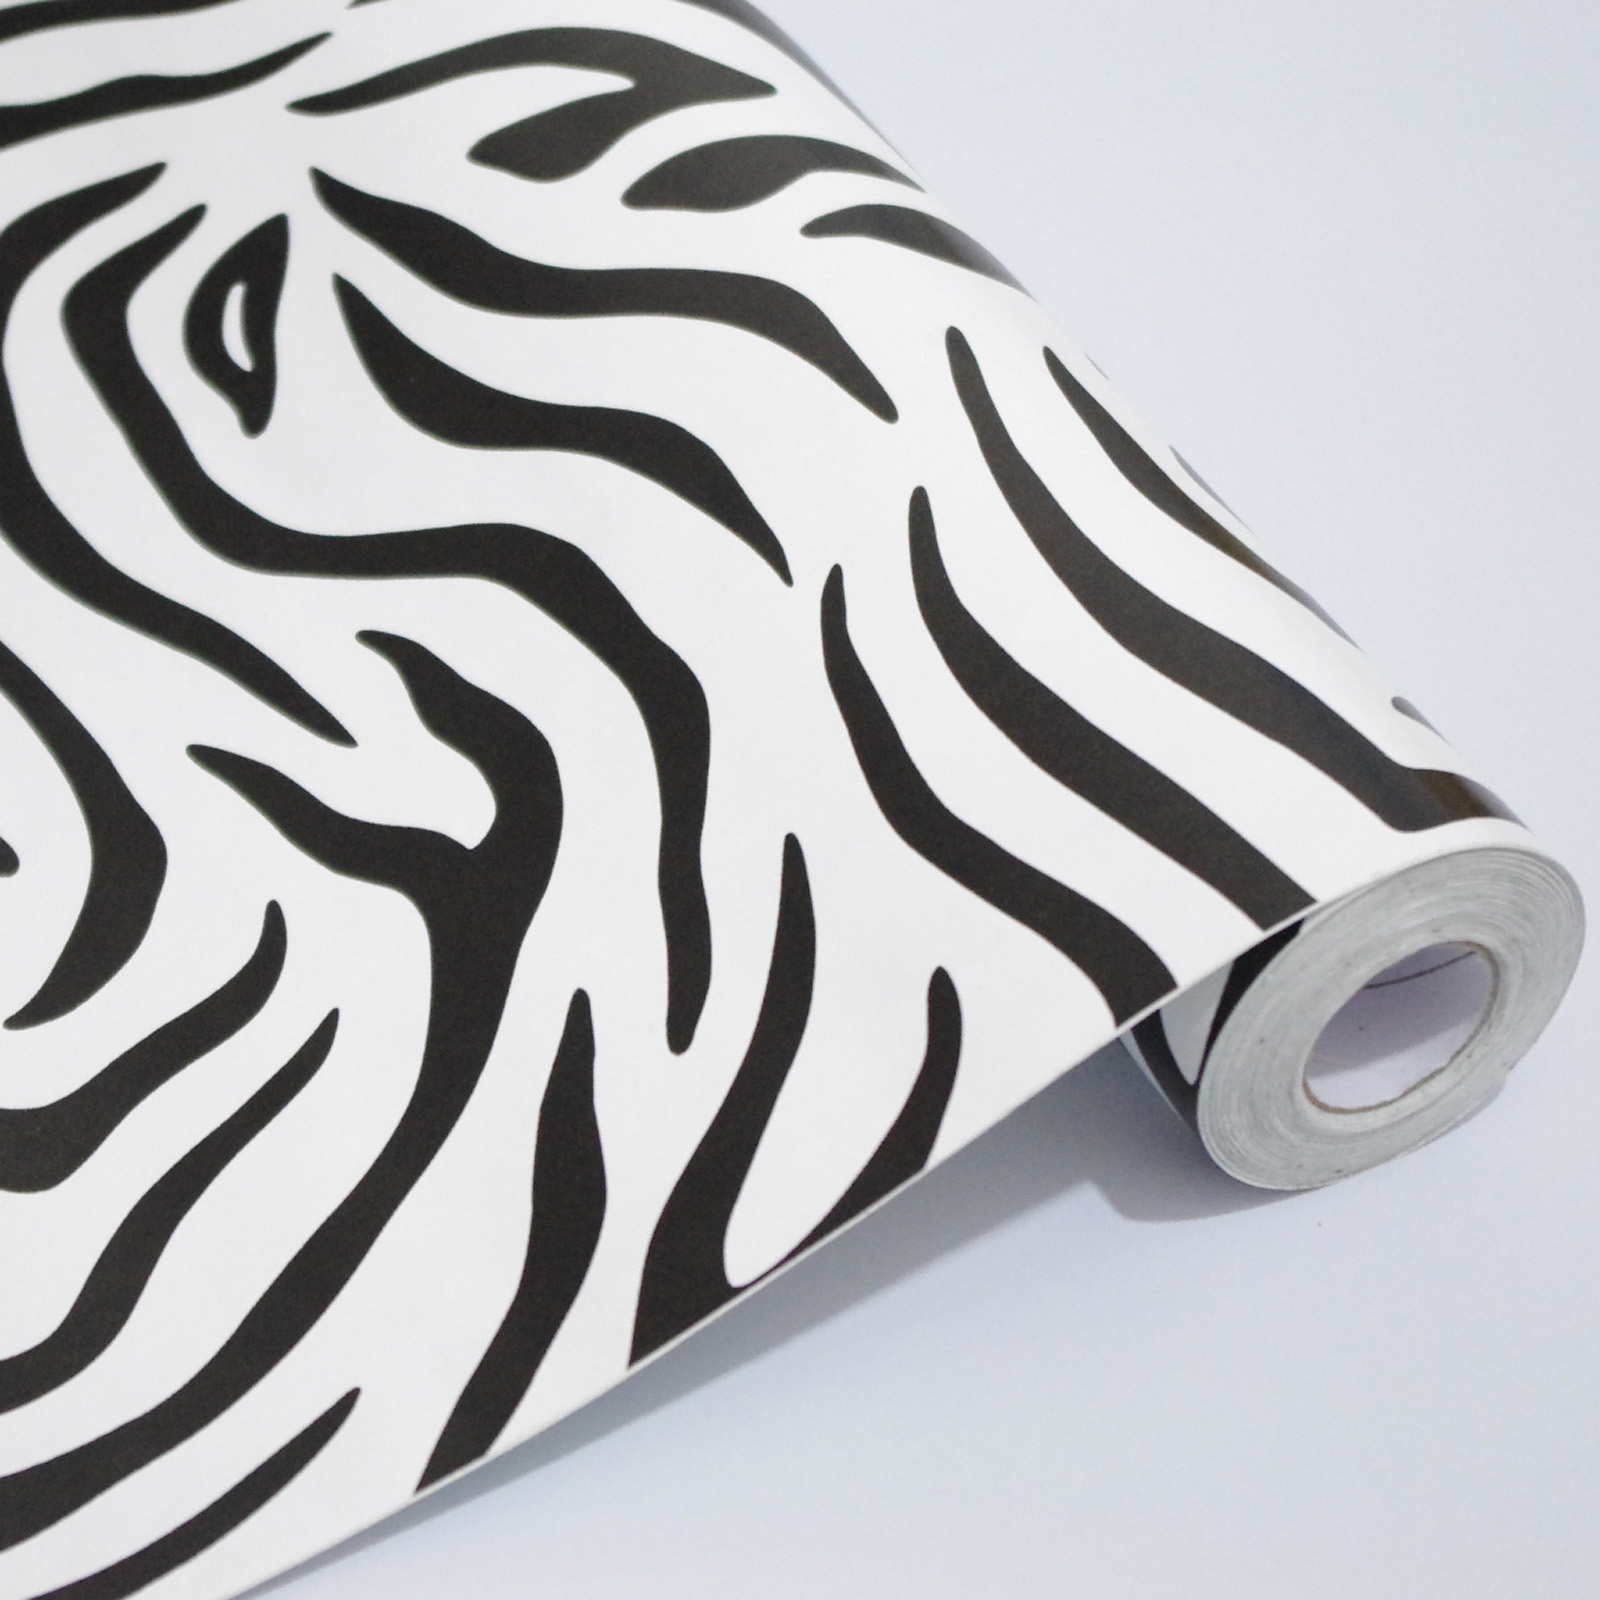 45+] Dog Print Wallpaper for Walls on WallpaperSafari